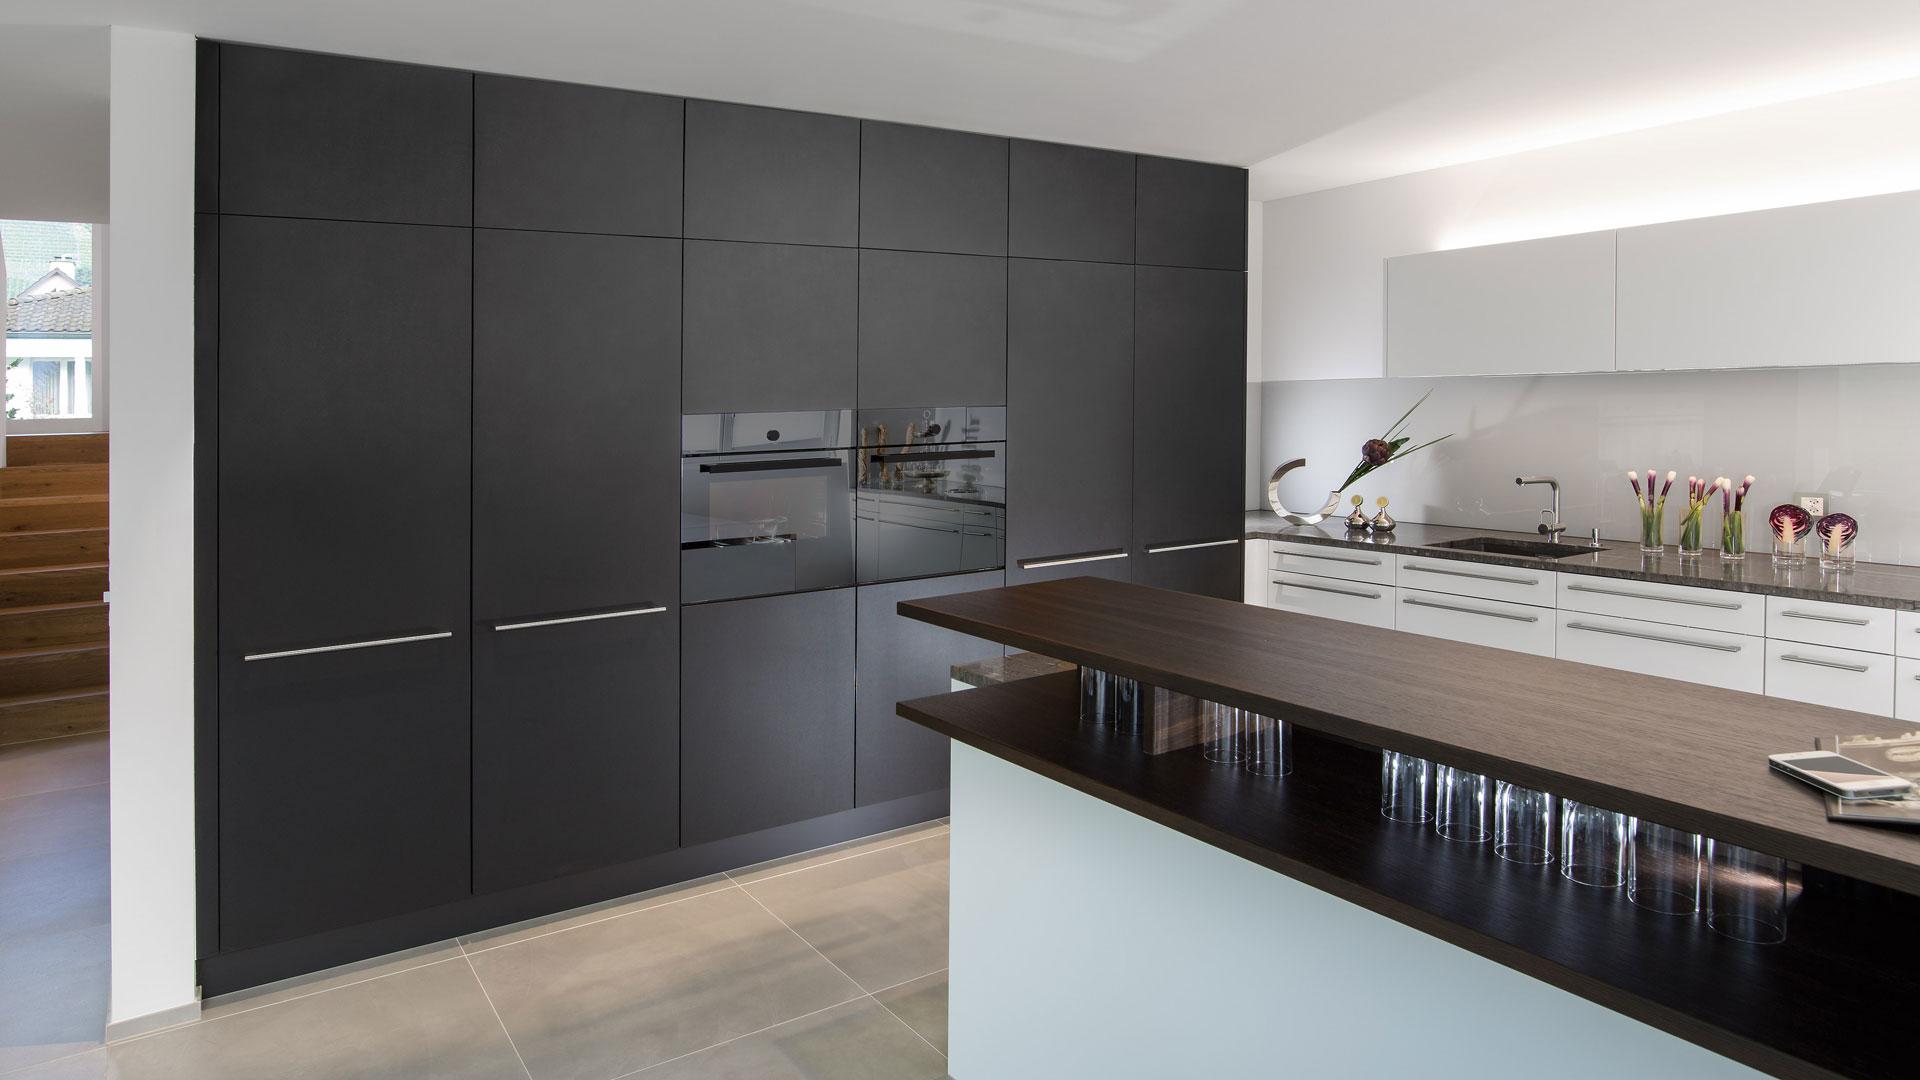 griffe k che glas spritzschutz k che hellweg. Black Bedroom Furniture Sets. Home Design Ideas